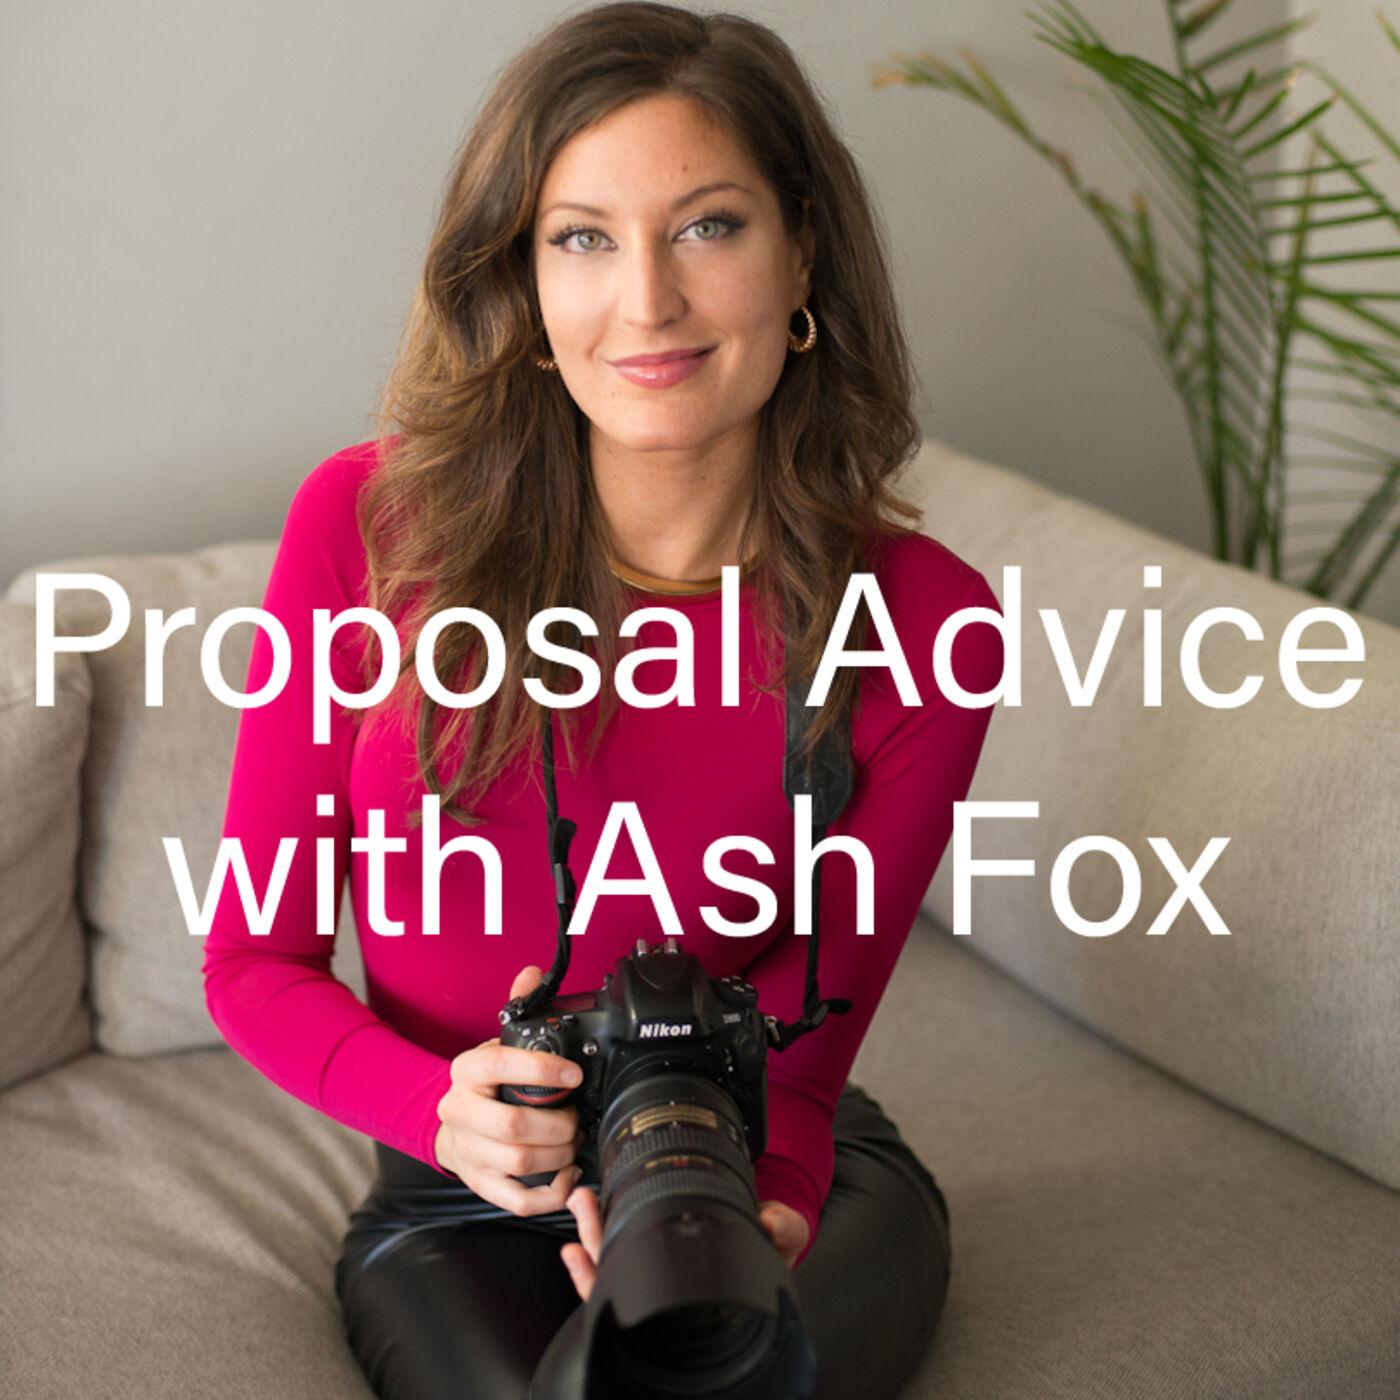 Proposal Advice with Ash Fox